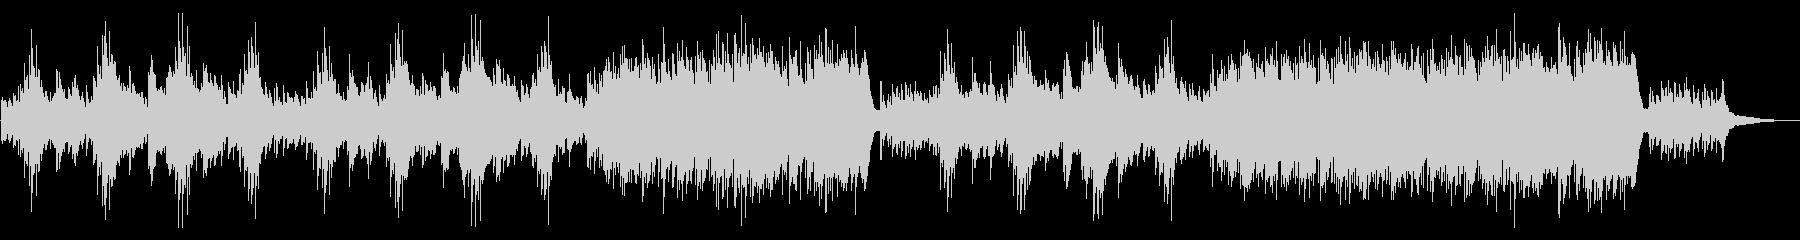 CMやVPに 圧倒的透明感感動弦楽ピアノの未再生の波形